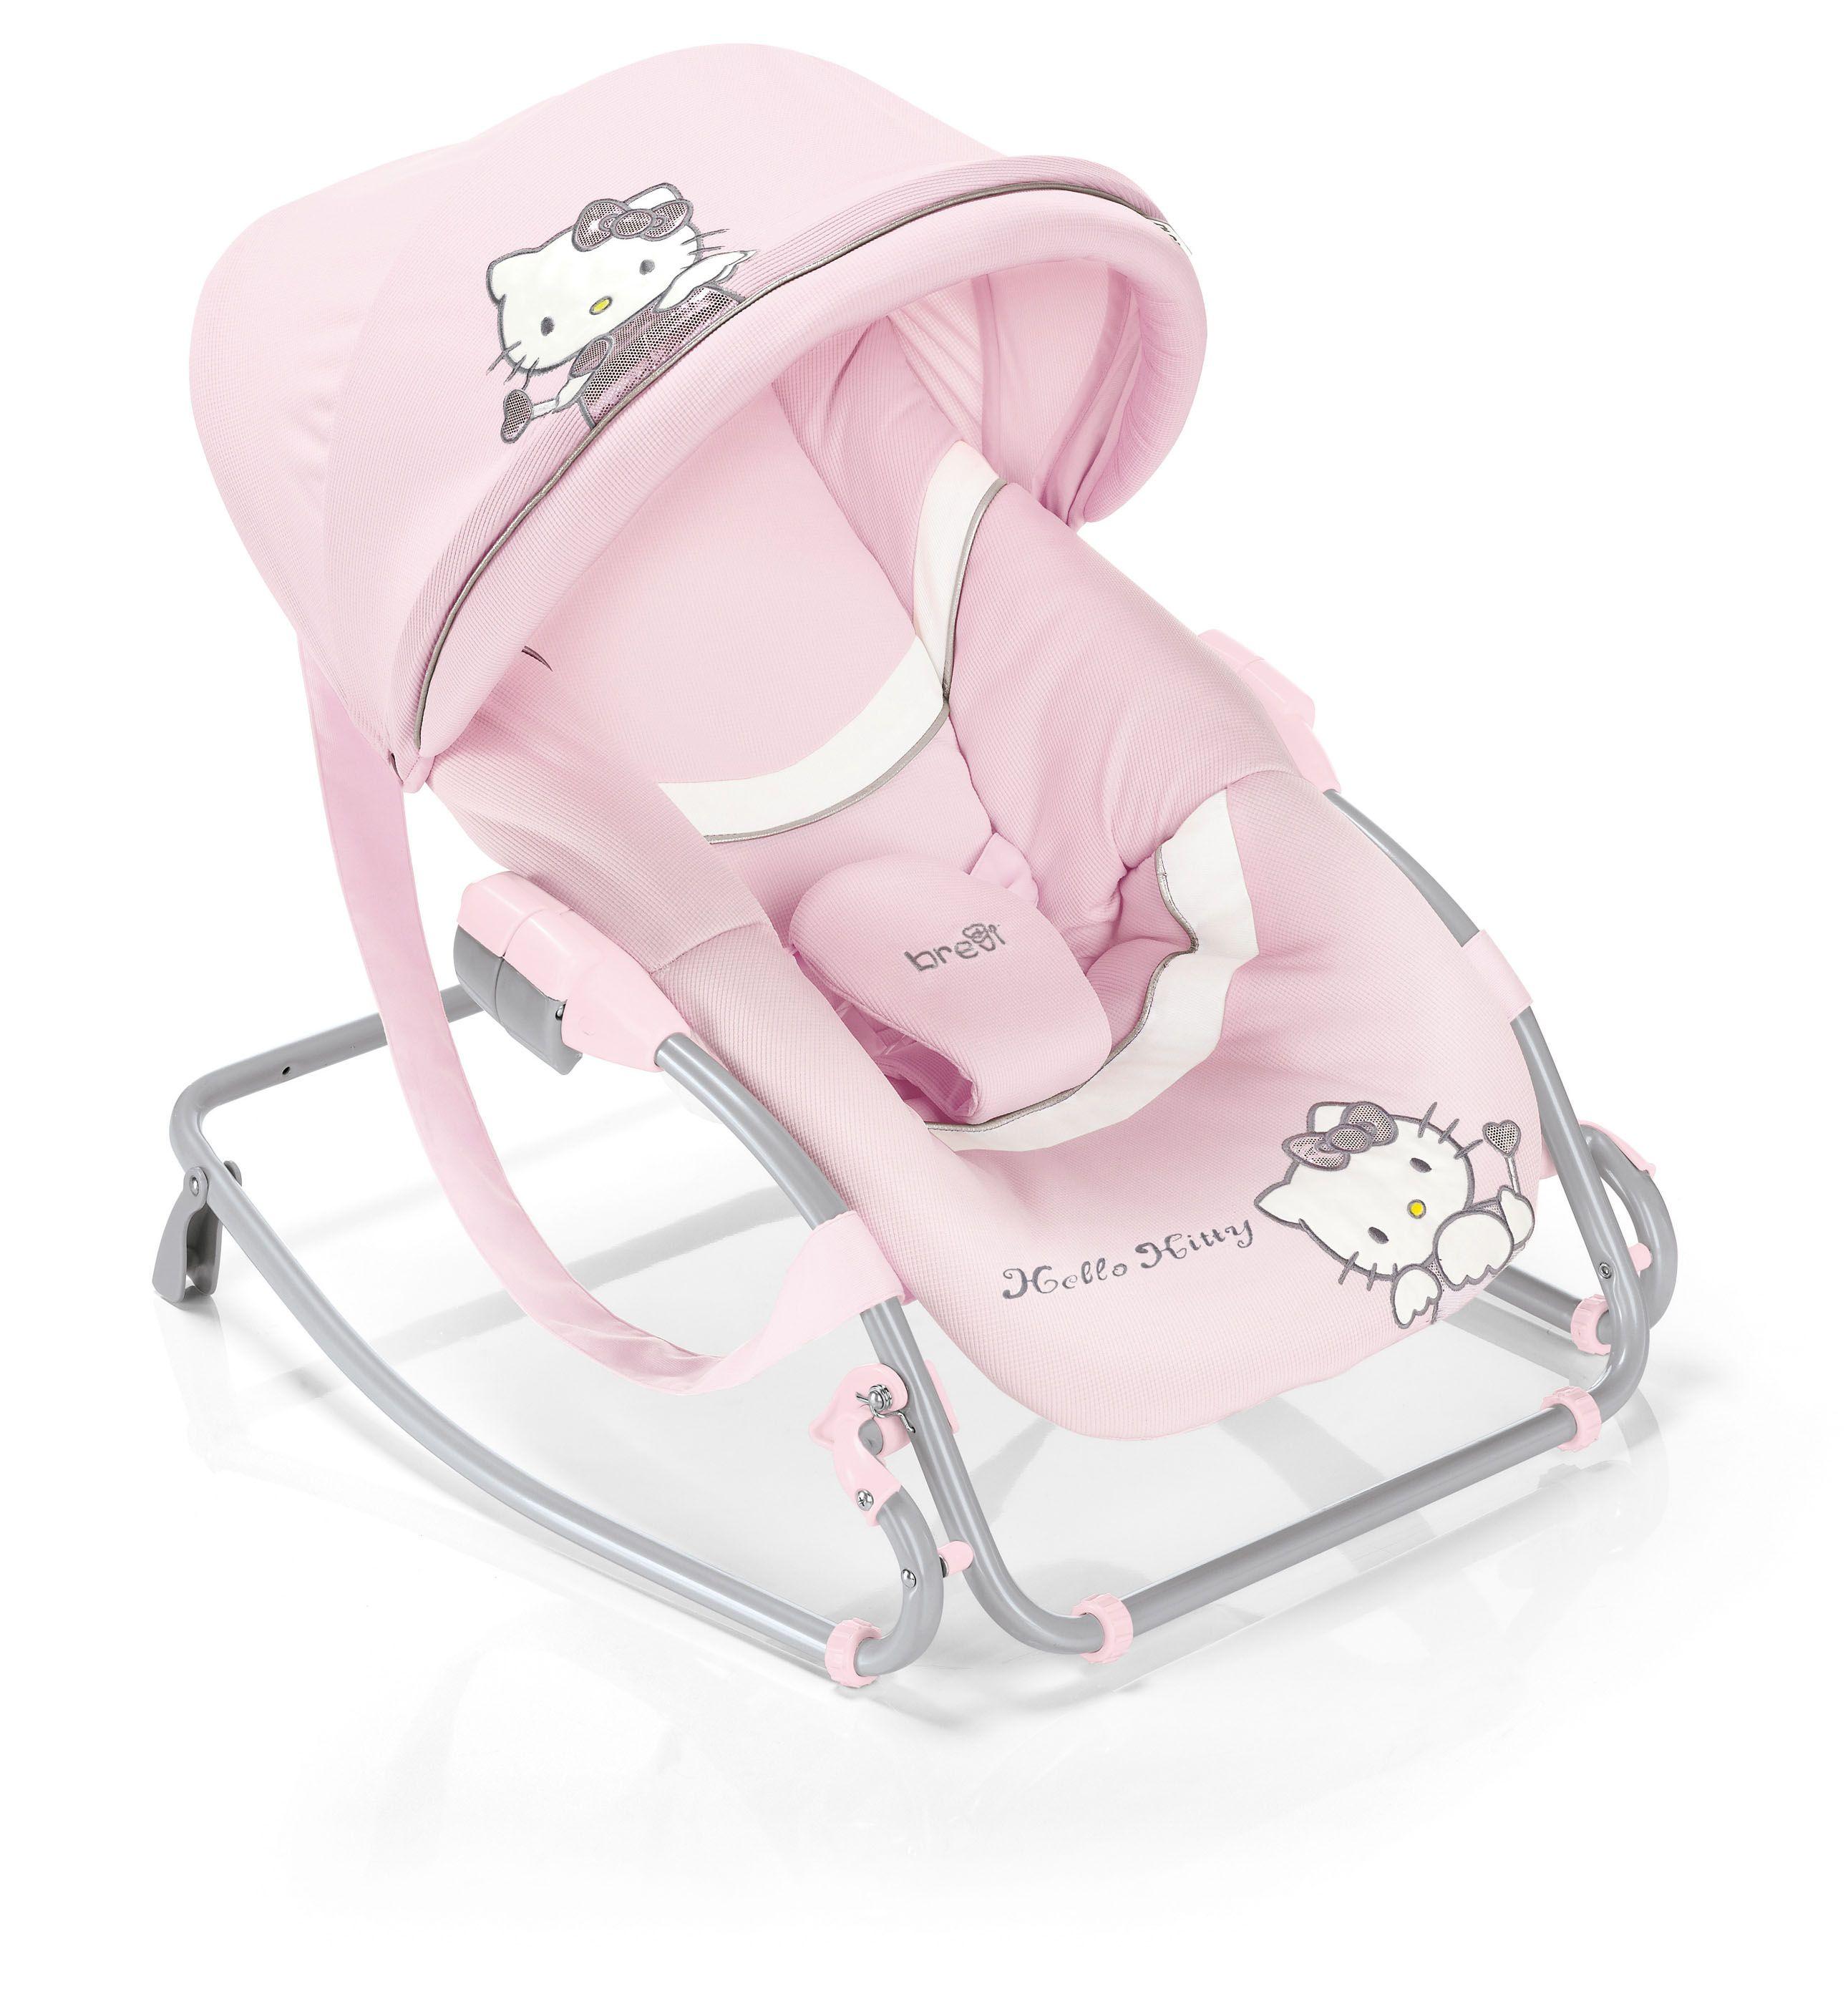 Brevi Hello Kitty sdraietta baby-rocker